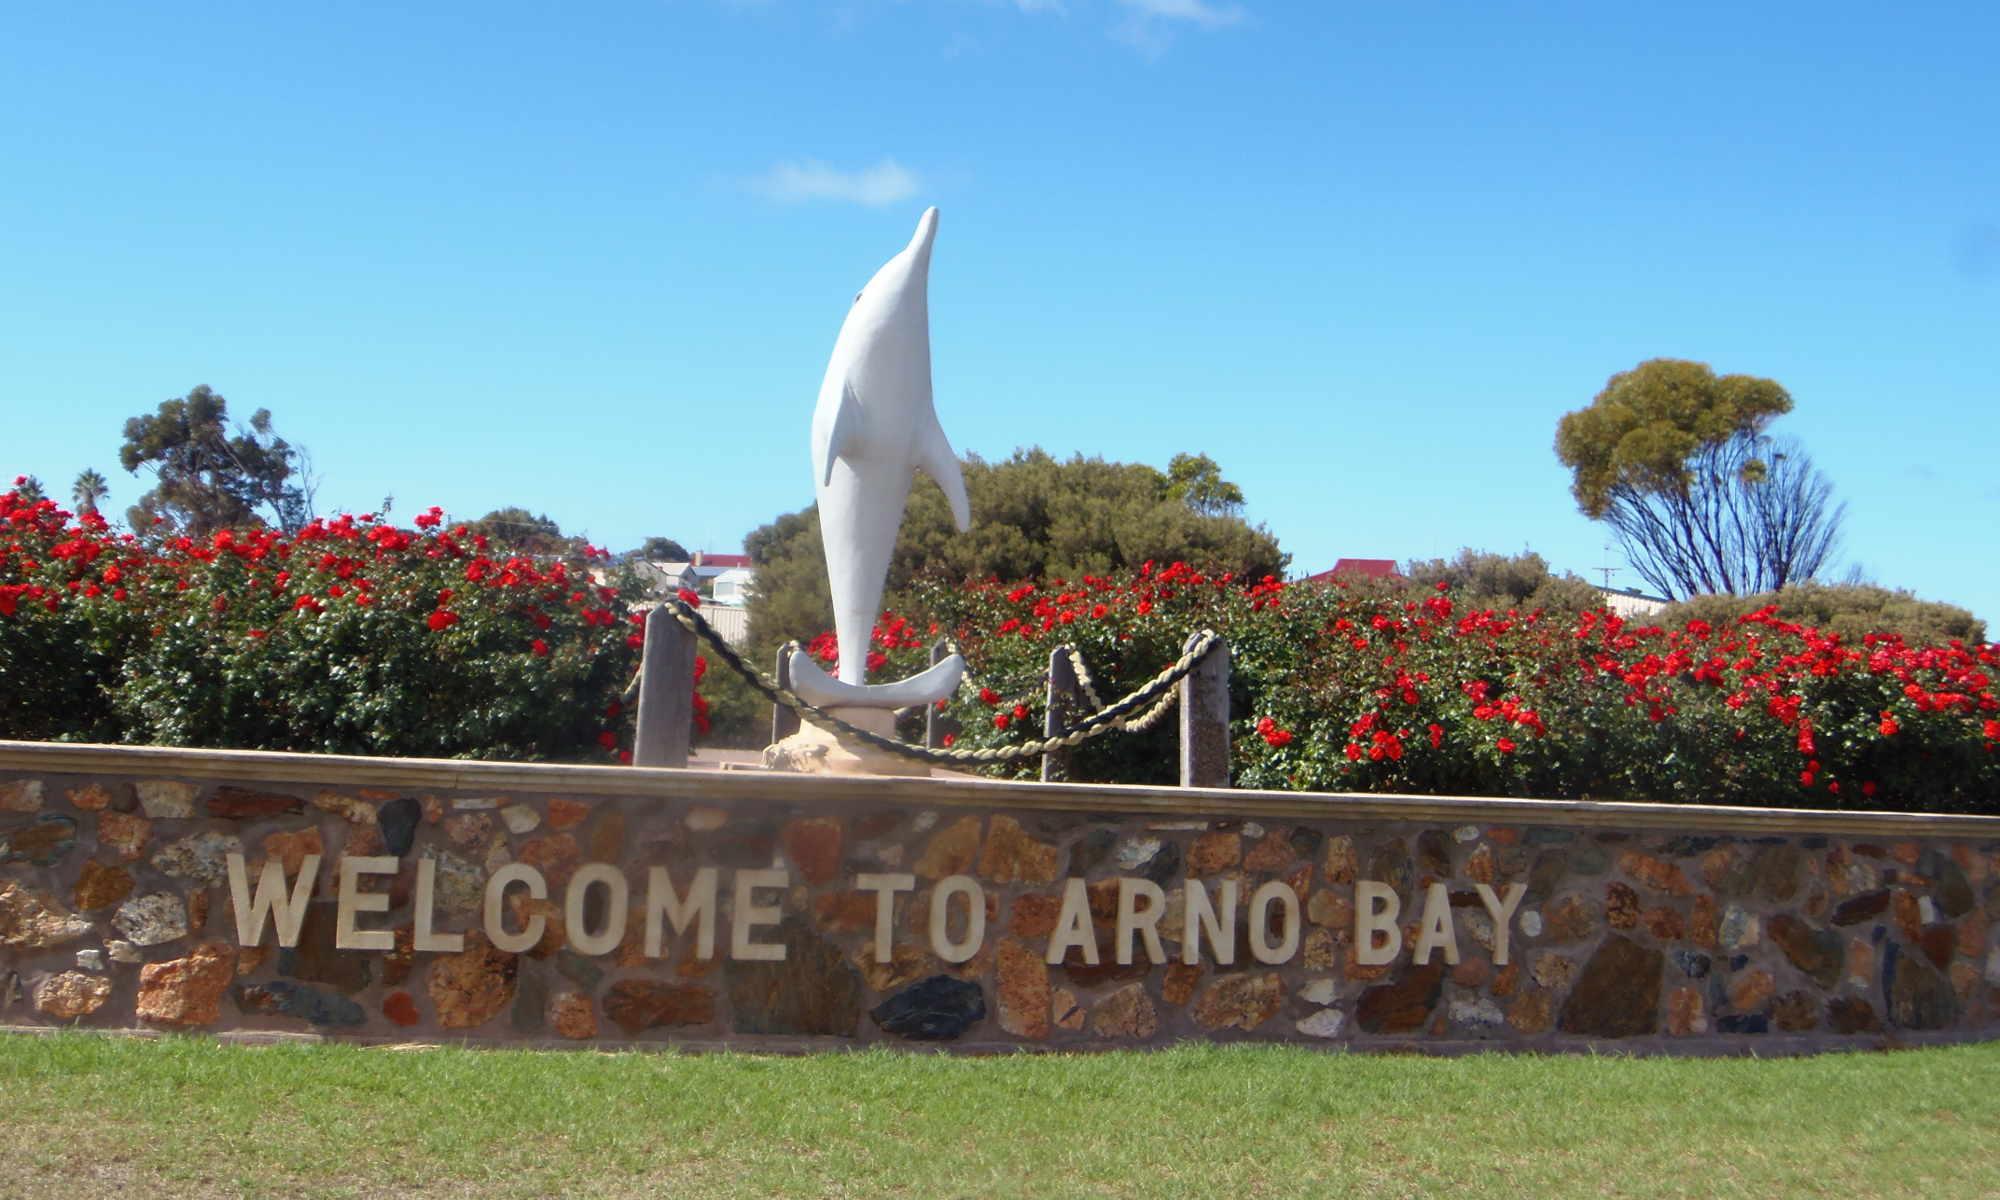 Arno Bay, South Australia